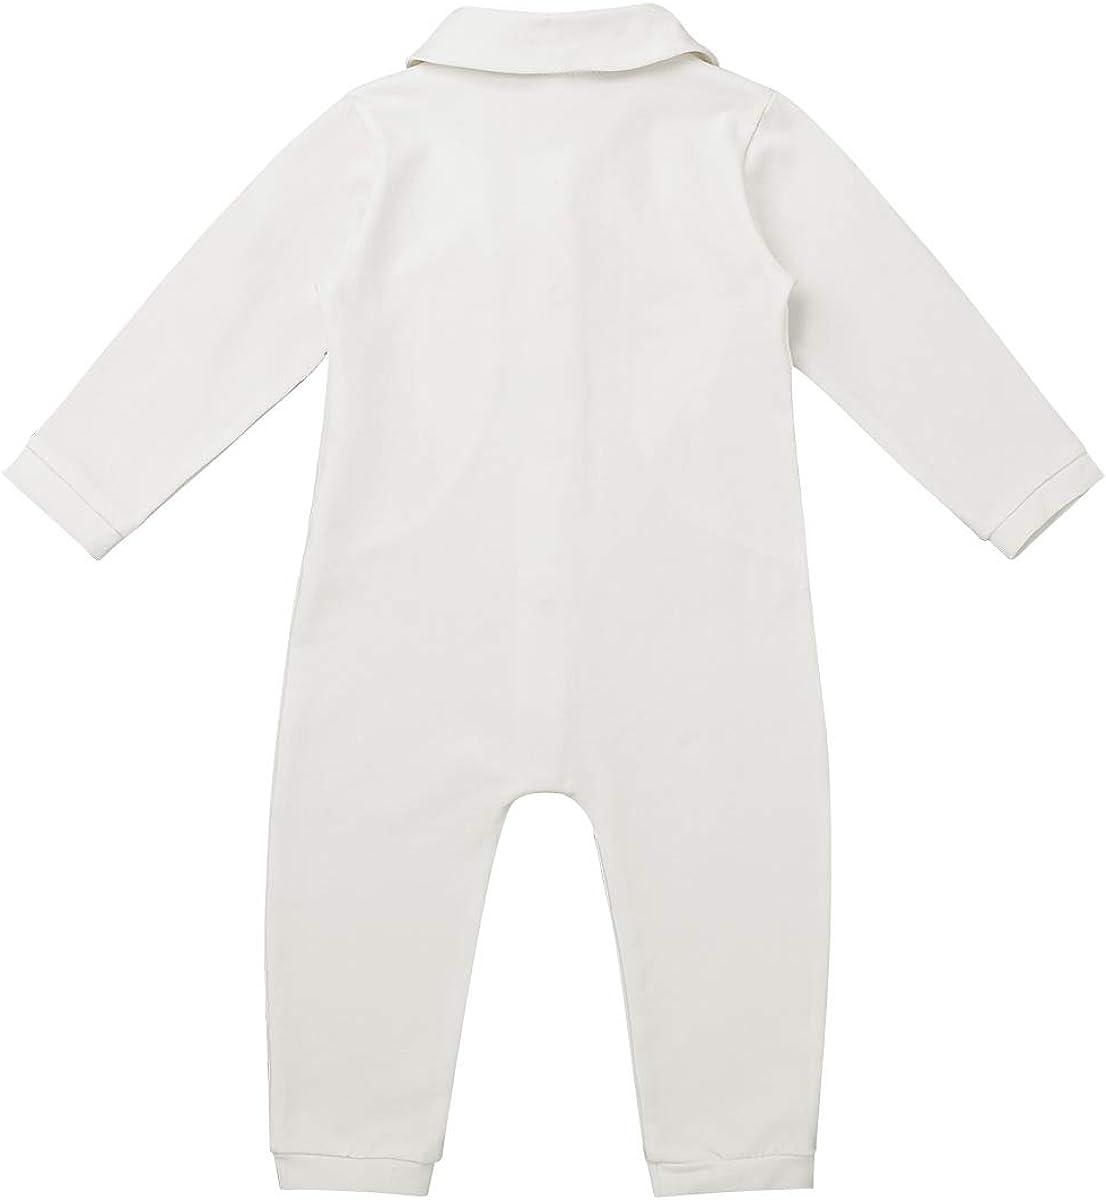 Haitryli Infant Baby Boys One Piece Long Sleeves Lapel Bowtie Romper Christening Baptism Suit